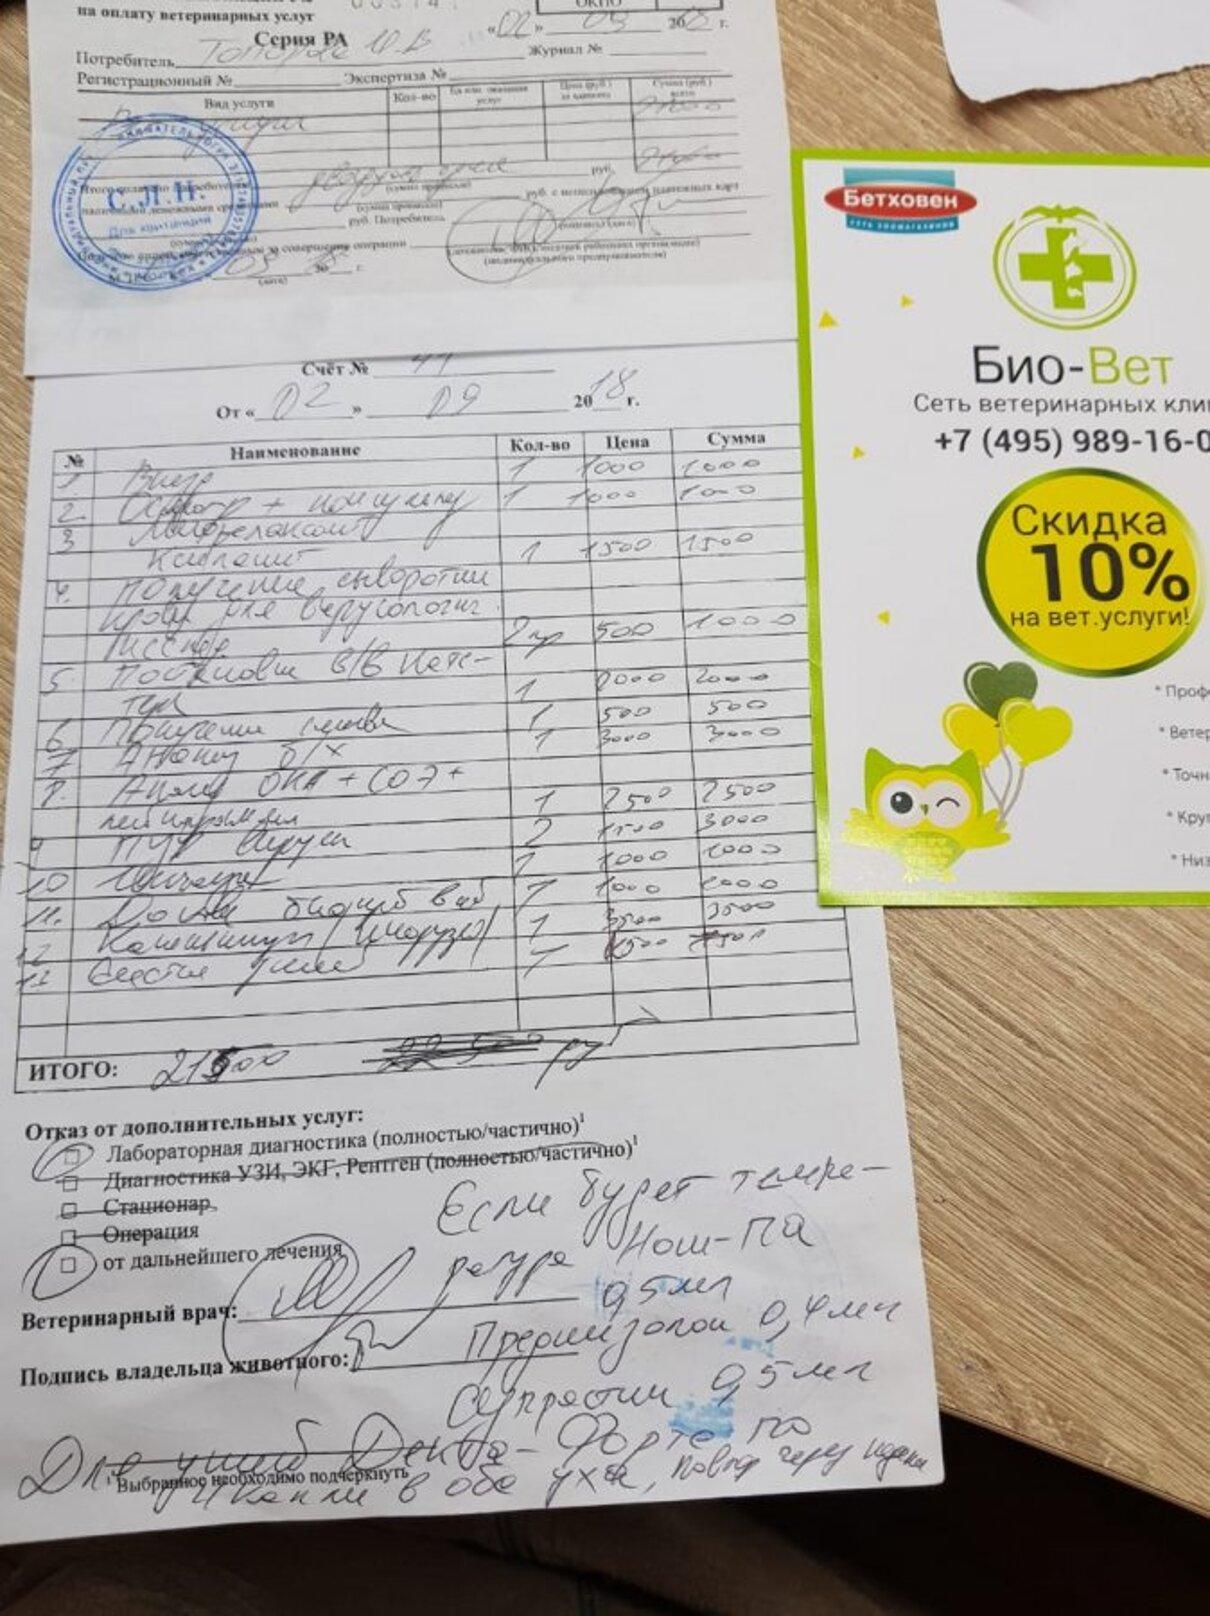 Жалоба-отзыв: Марченков Олег Александрович - Ветеринар - мошенник-живодер-убийца.  Фото №3